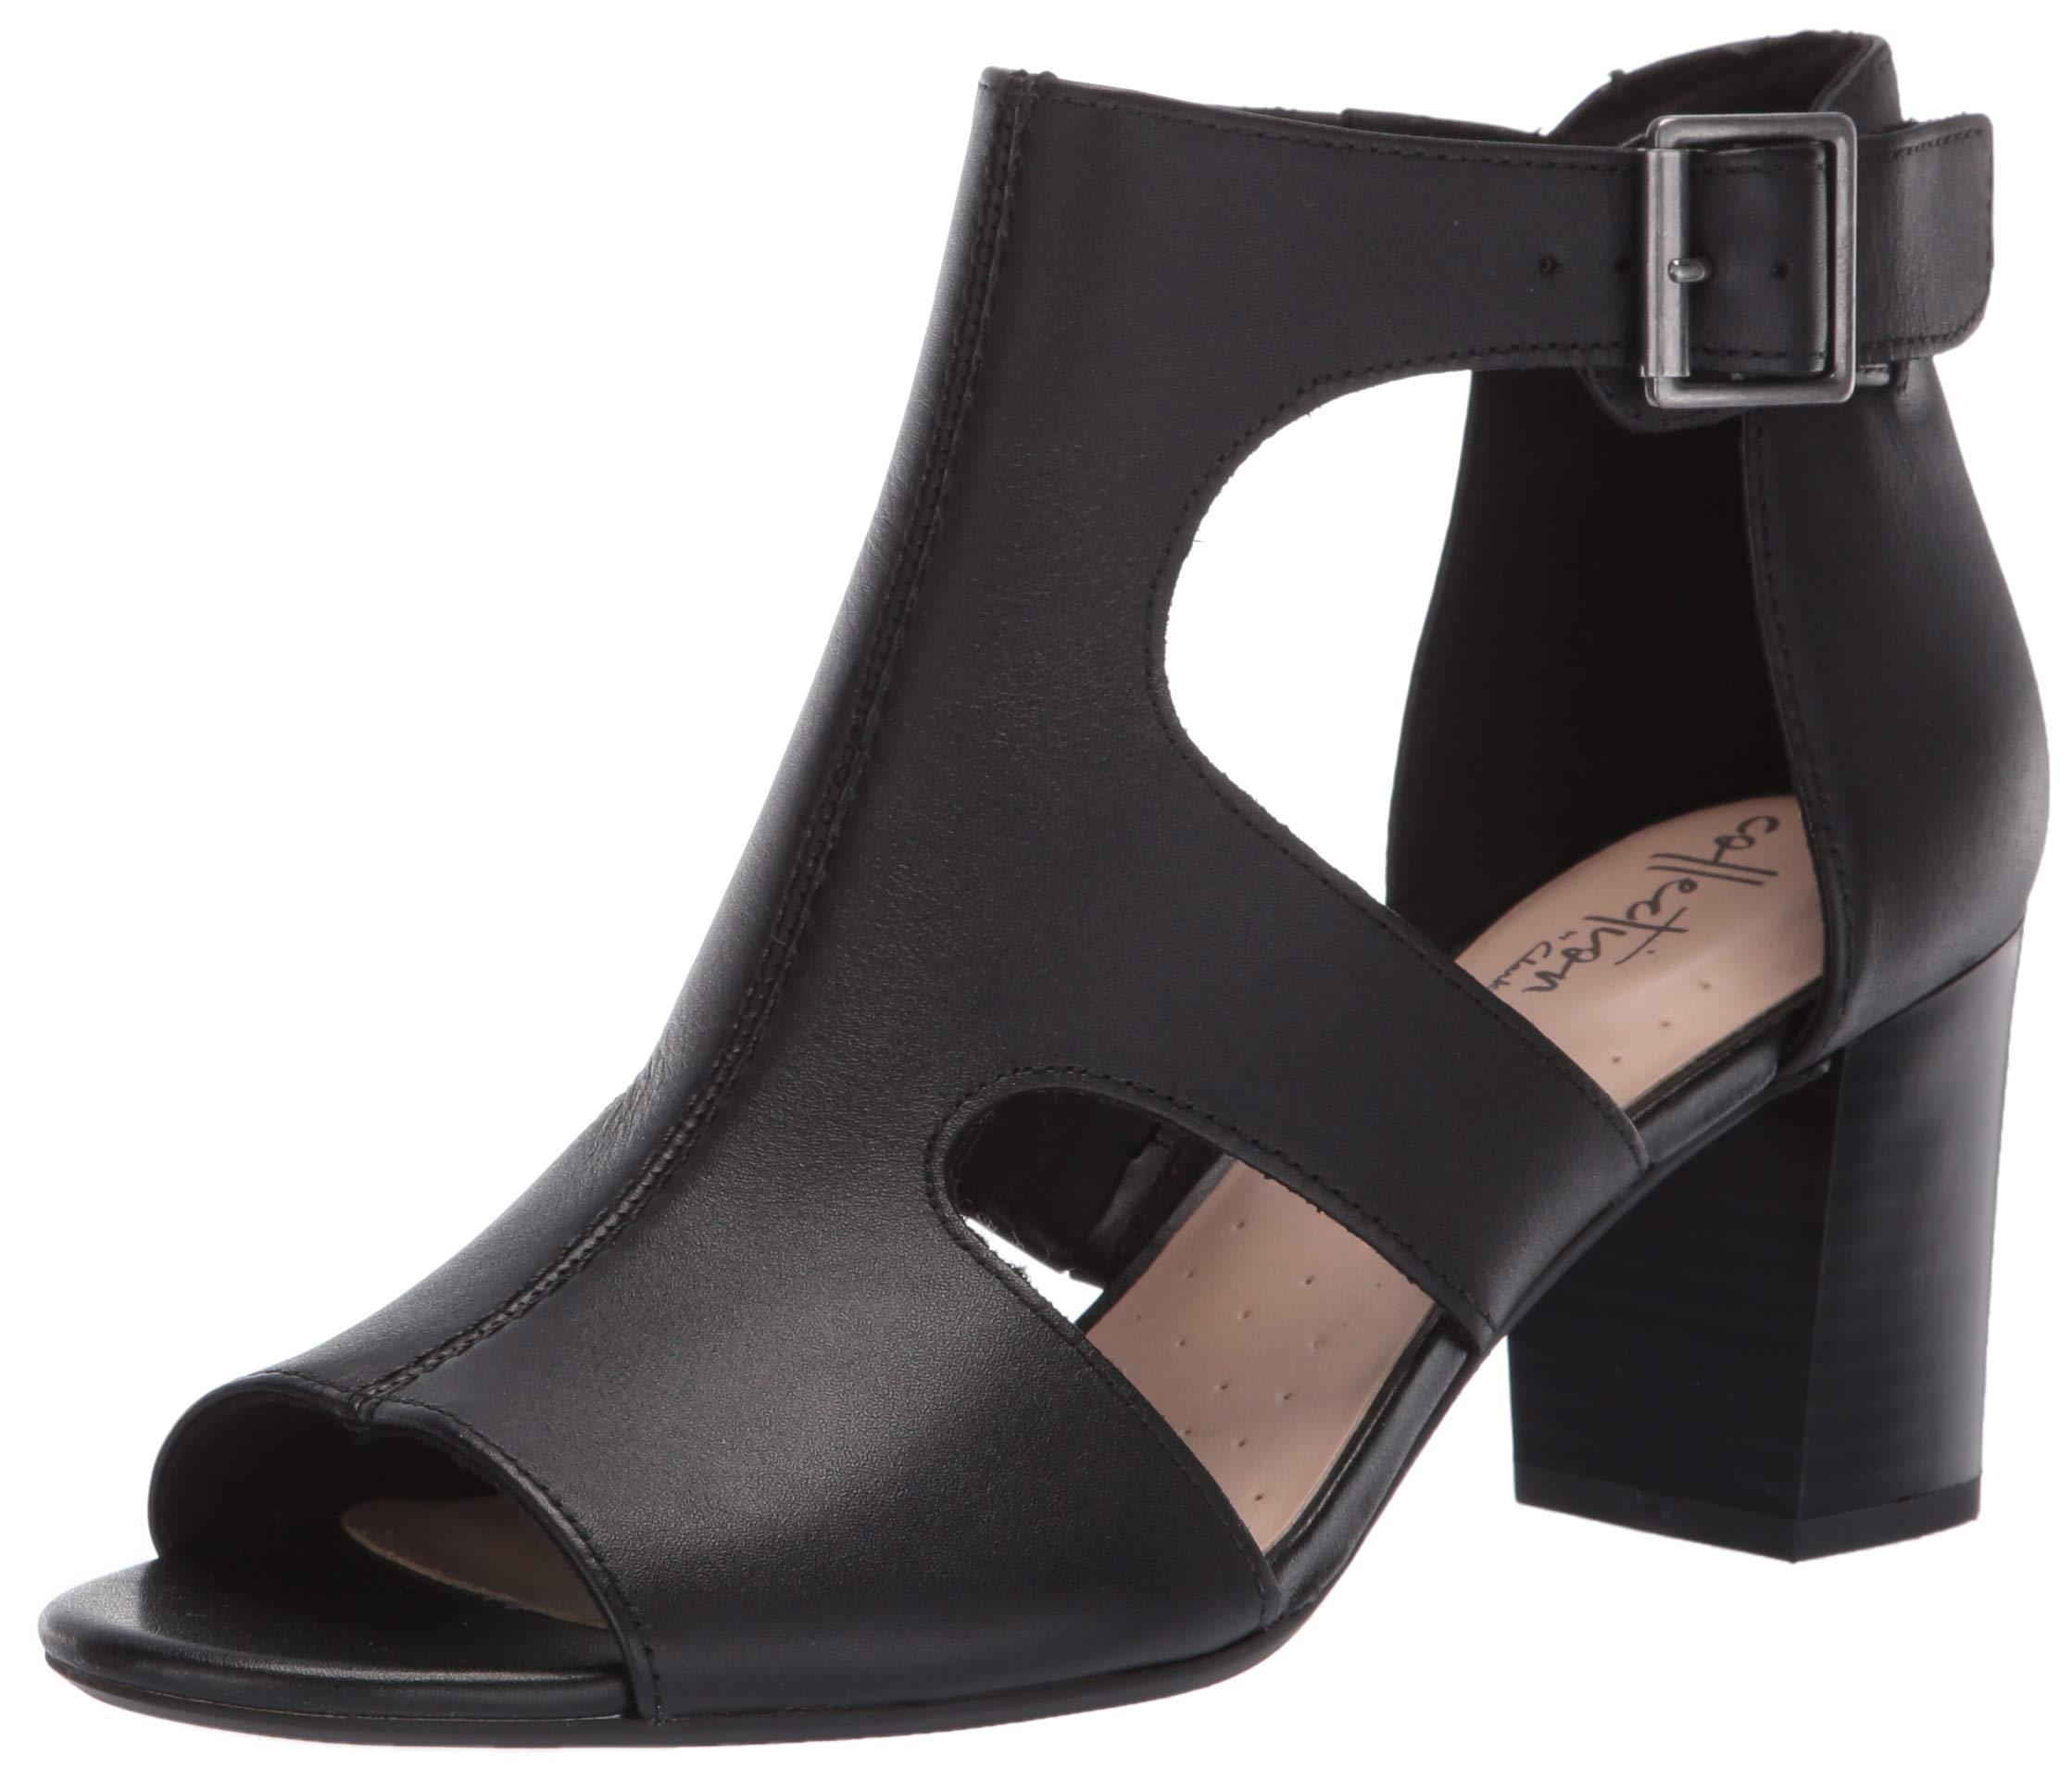 CLARKS Women's Deva Heidi Heeled Sandal, Black Leather, 085 M US by CLARKS